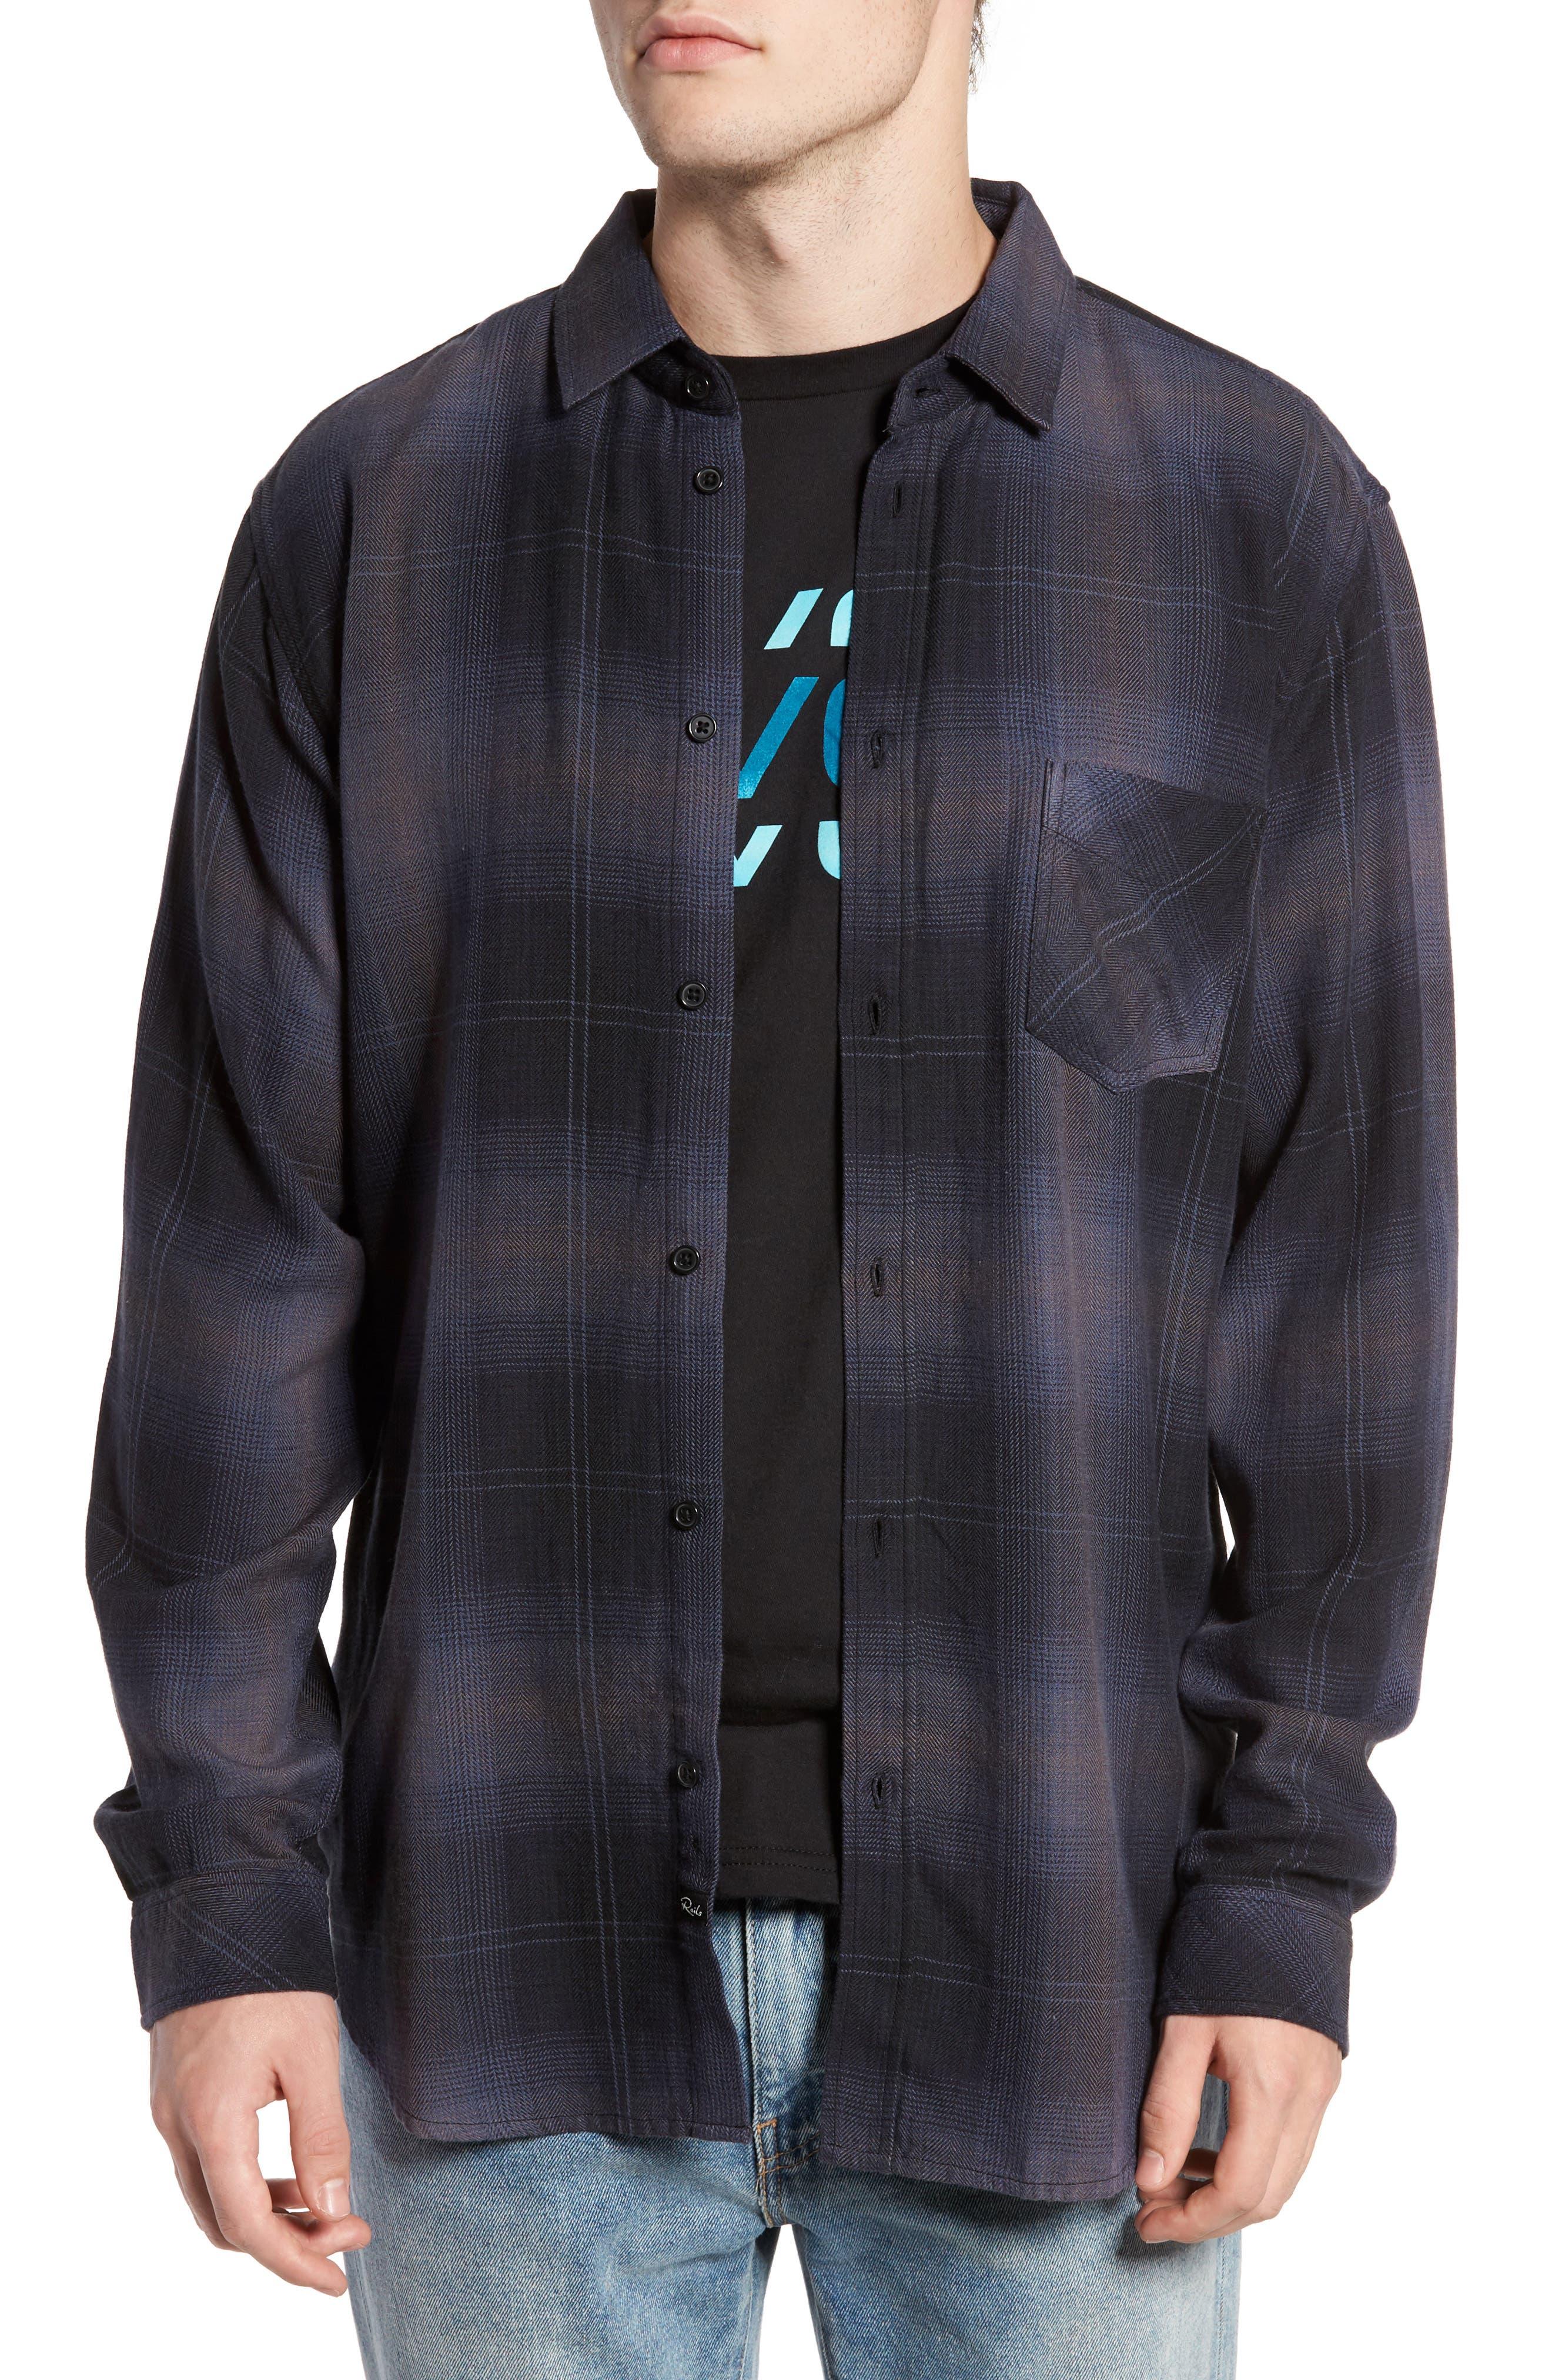 Lennox Sport Shirt,                             Main thumbnail 1, color,                             CHARCOAL/ BLACK